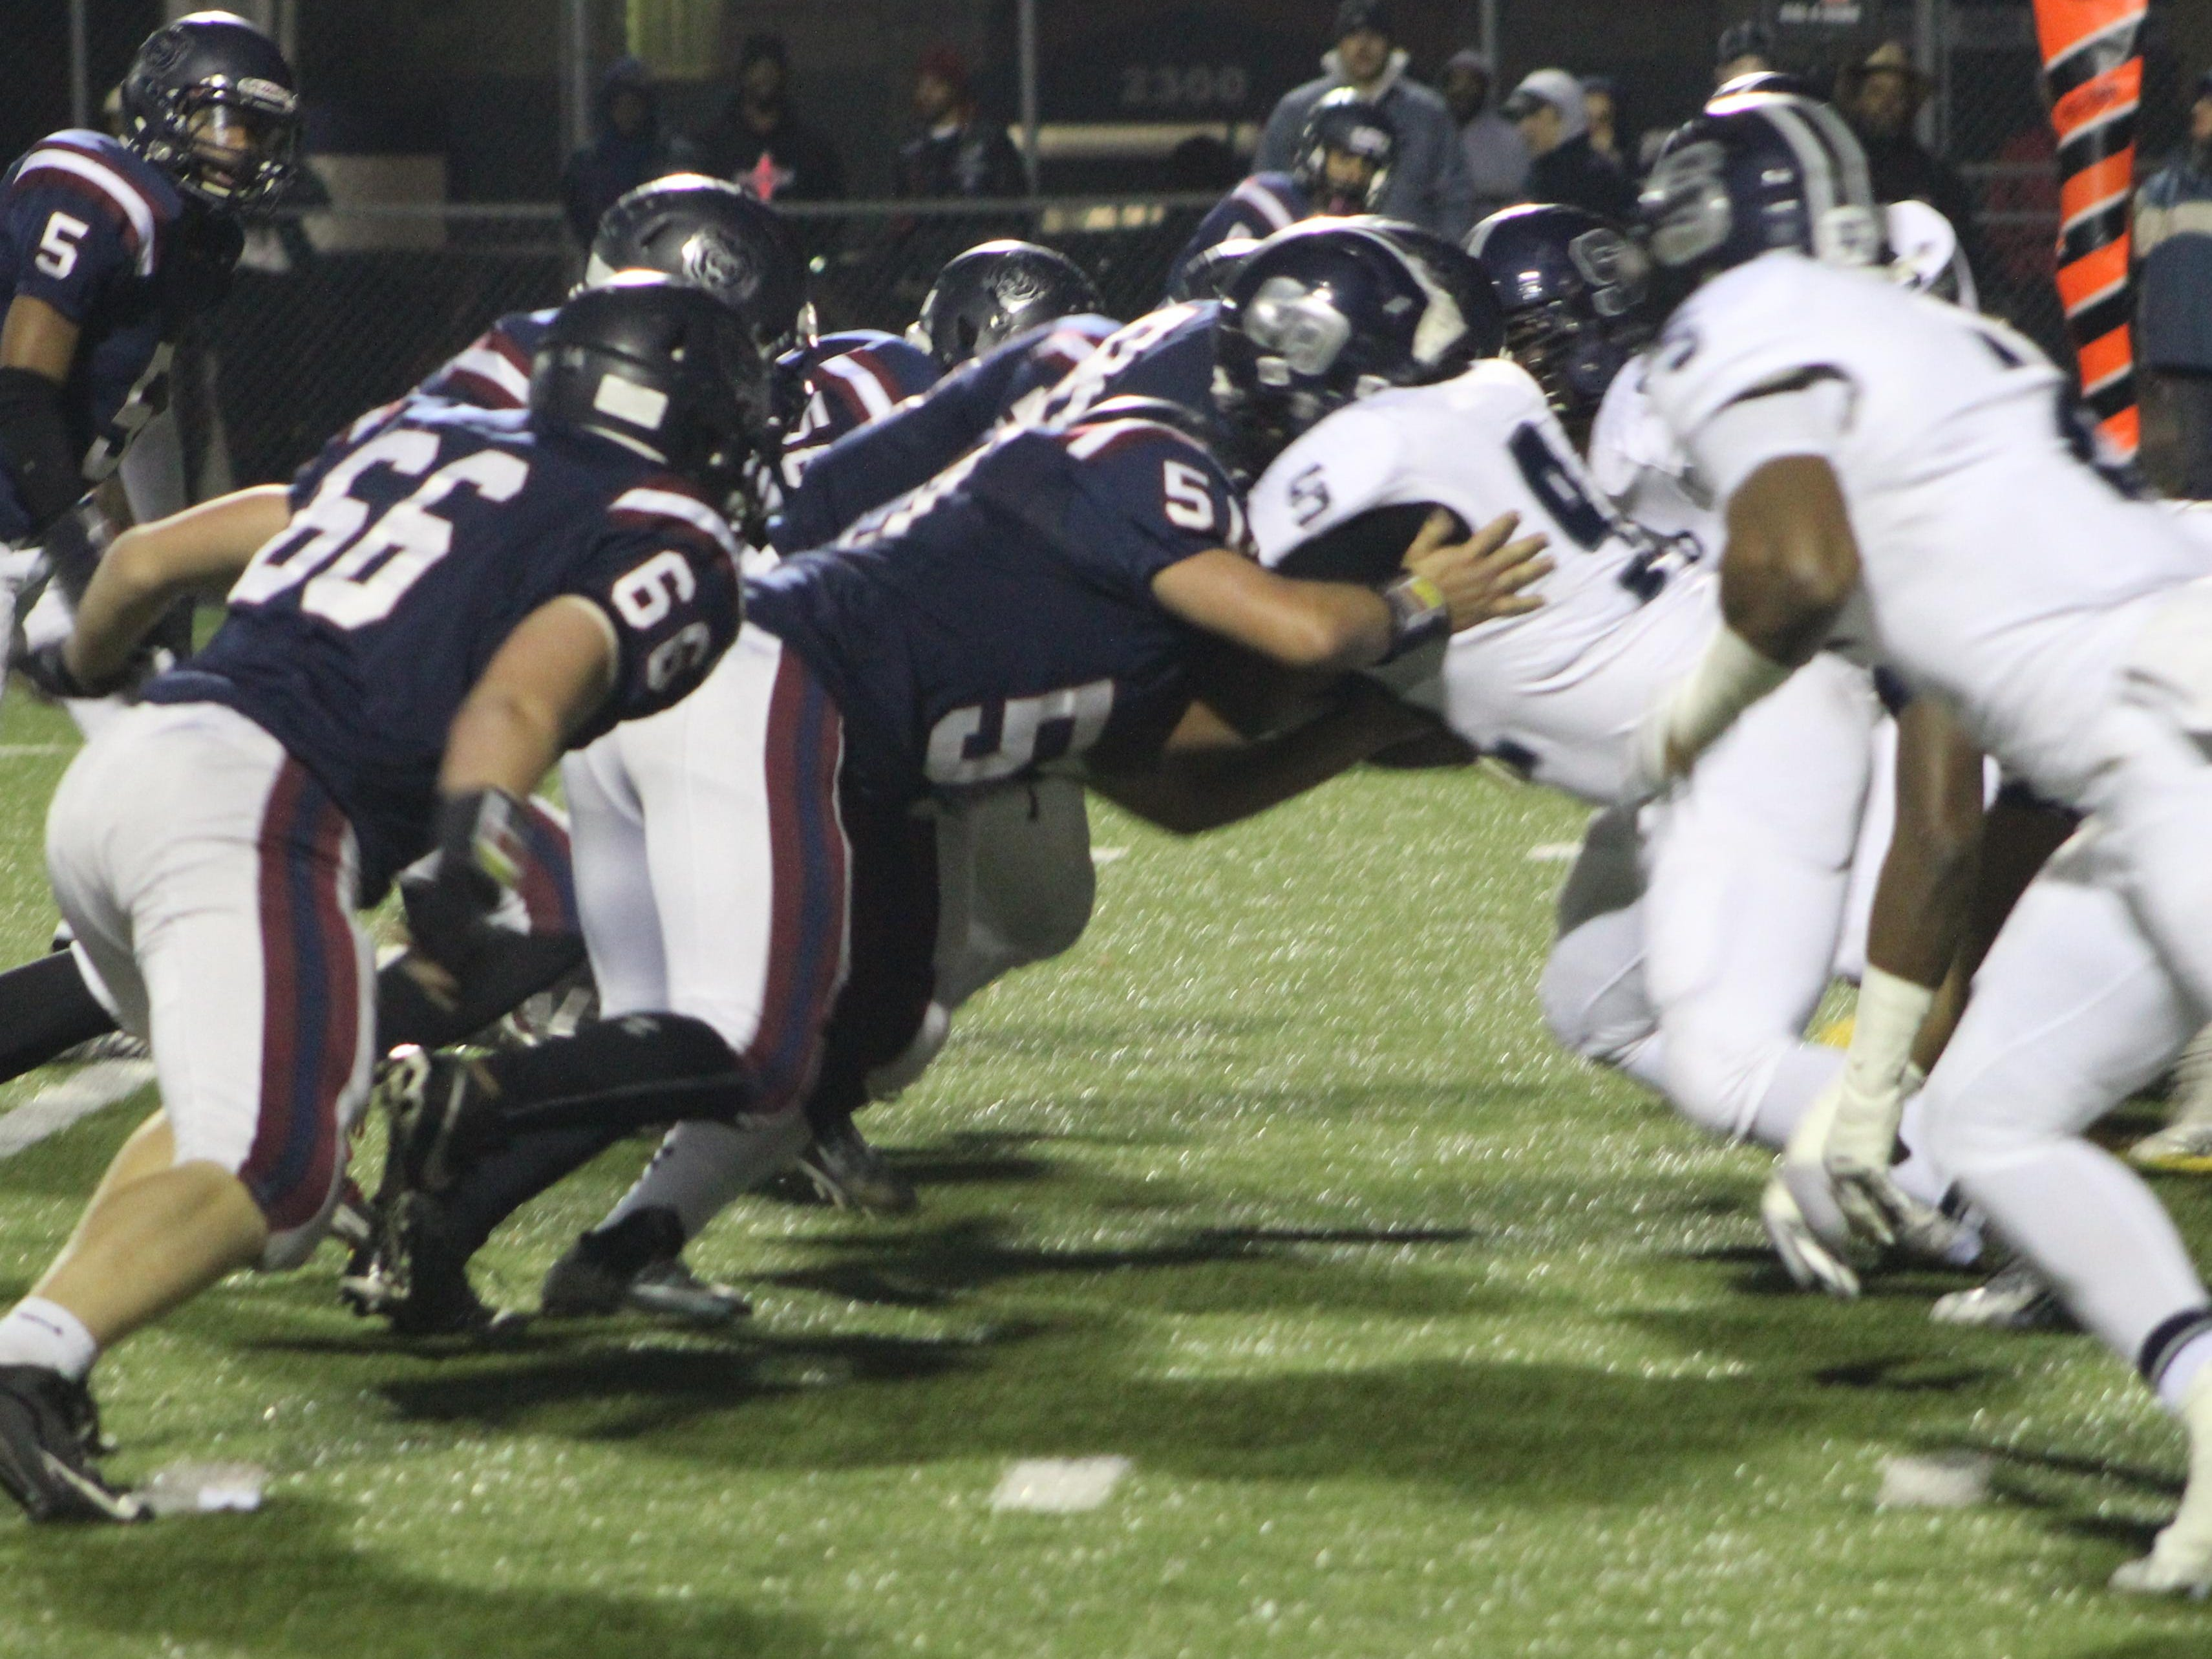 Southfield's defensive line (right) converges to stop Berkley quarterback Ross Herron for a short gain.